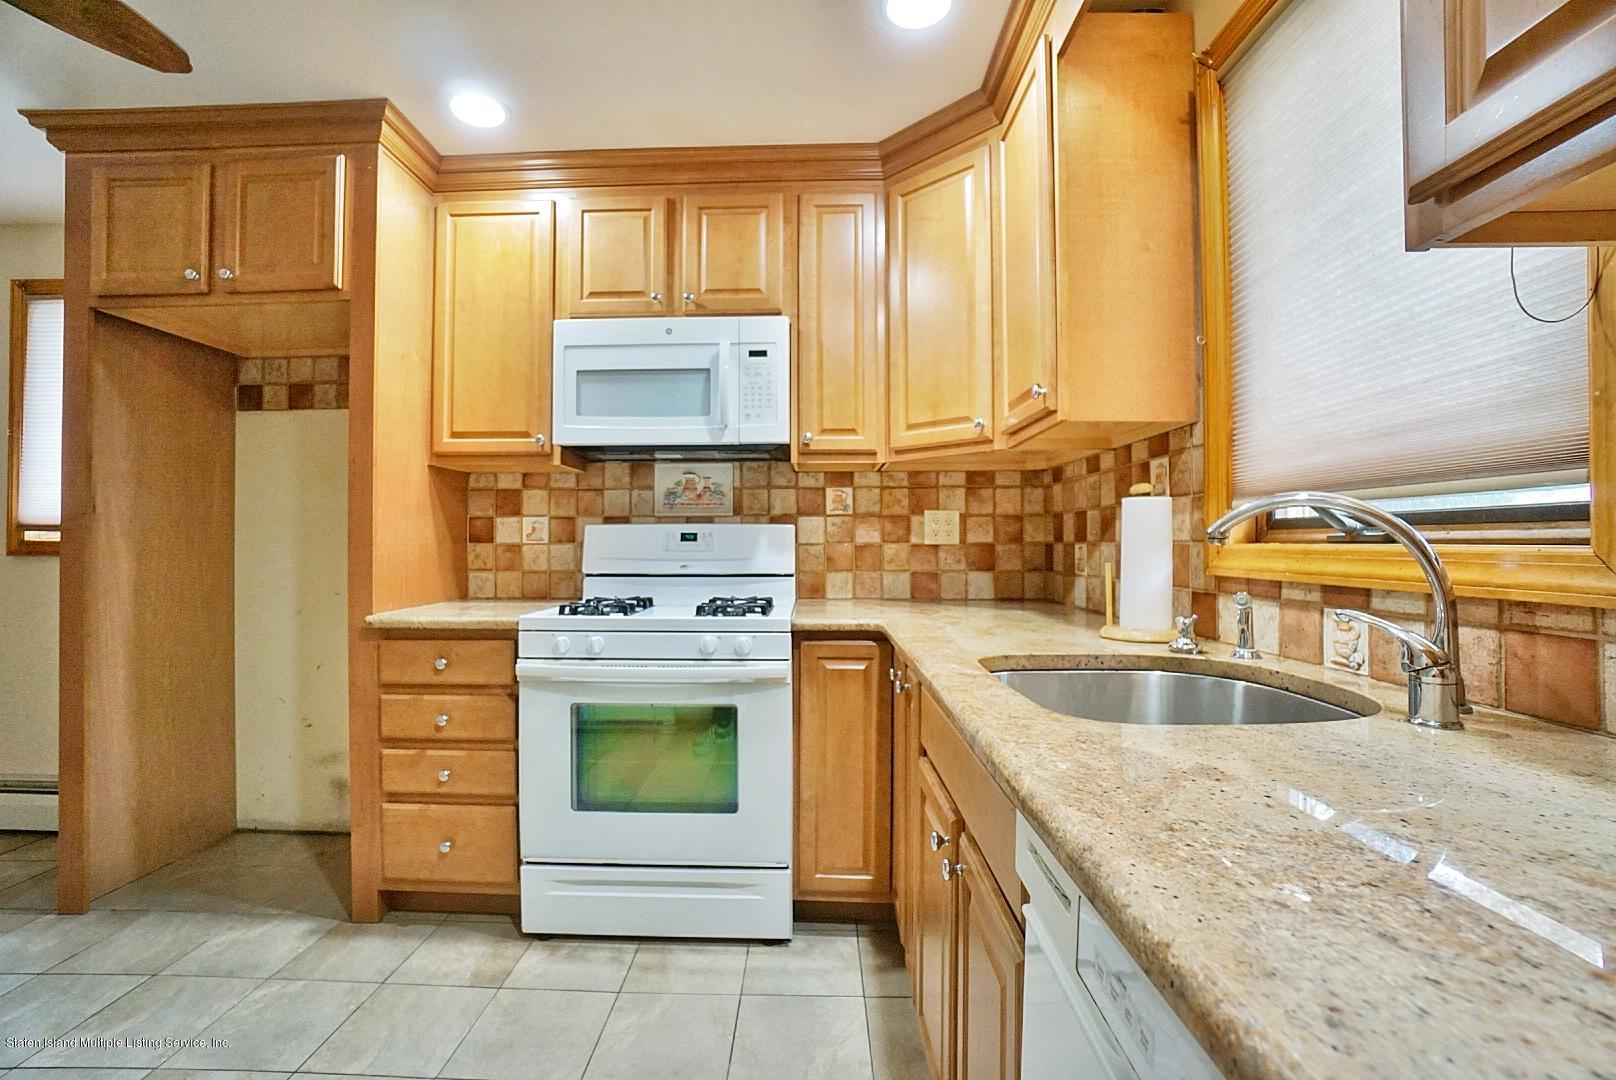 Single Family - Detached 55 Lyndale Avenue  Staten Island, NY 10312, MLS-1128769-6